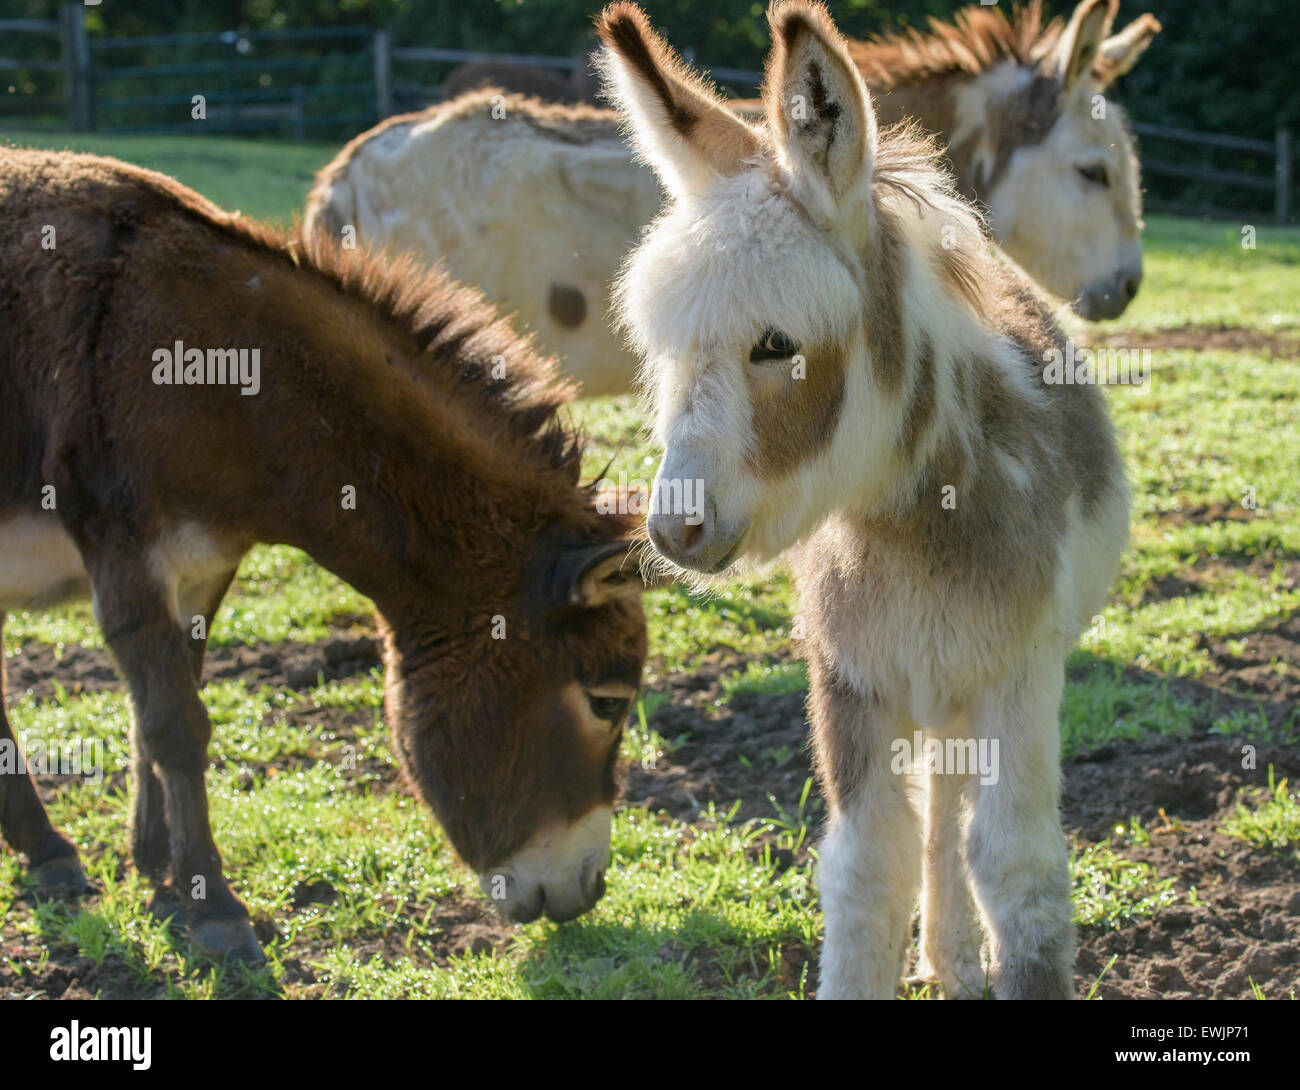 Miniature donkey jenny and foal - Stock Image